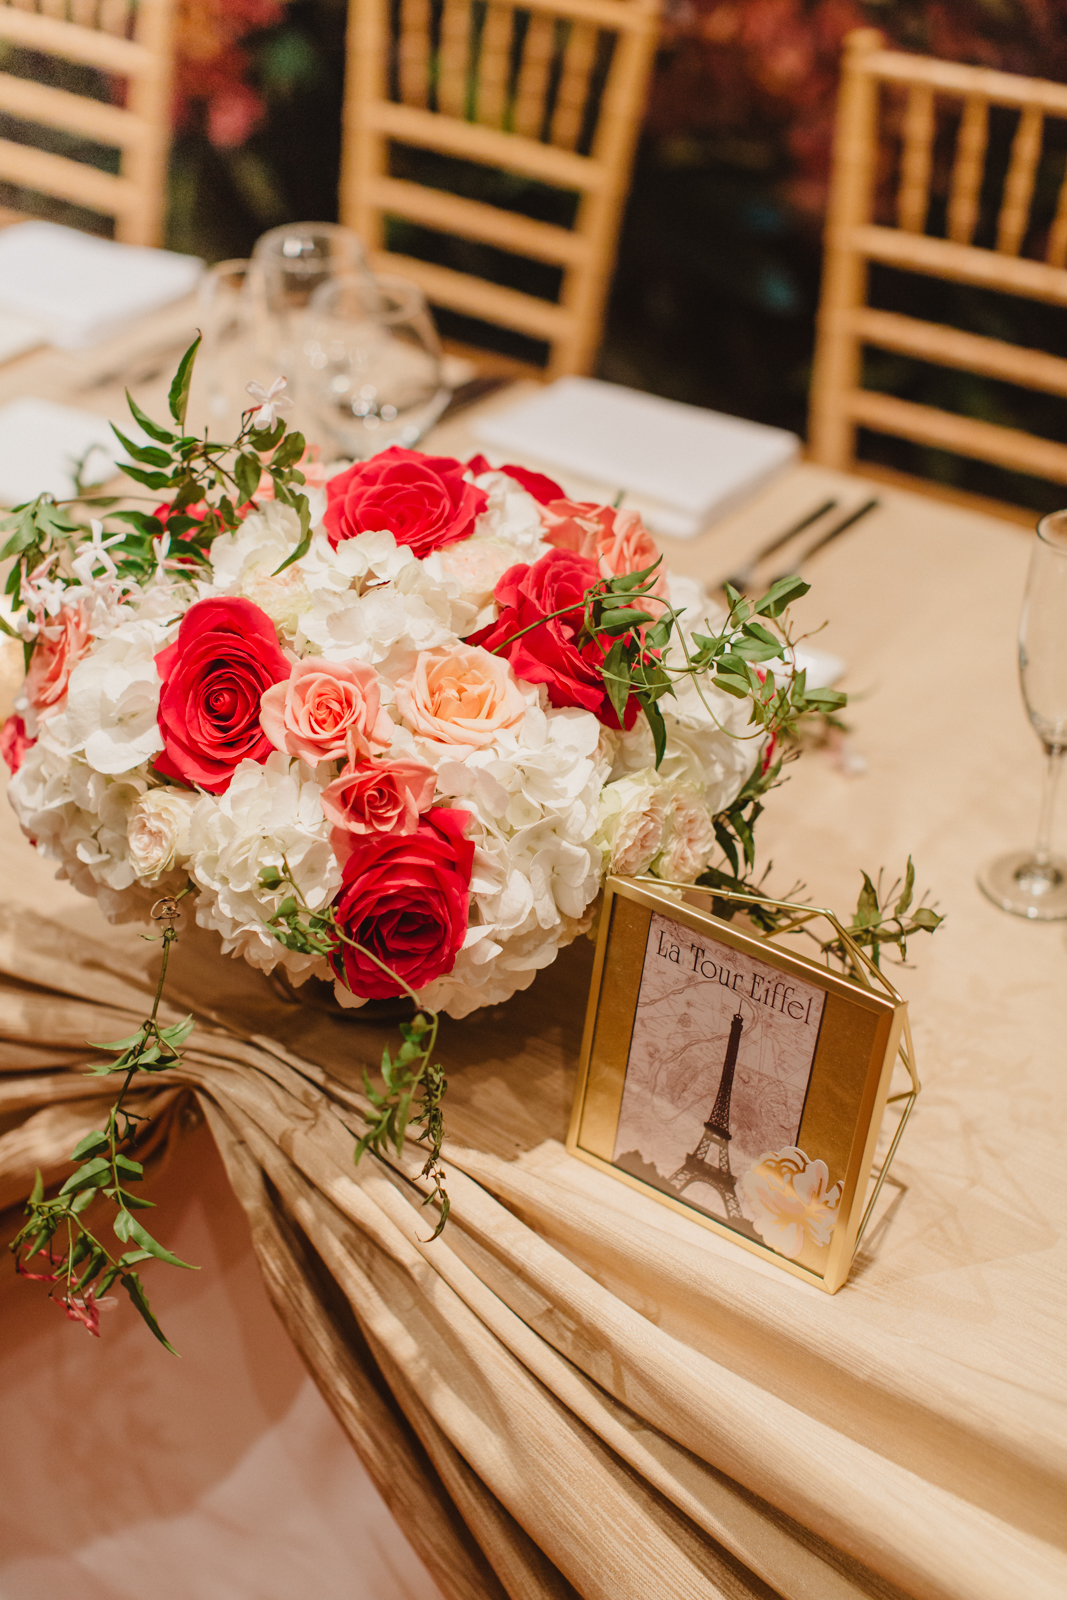 NYC Wedding Photography Sofitel Central Park Brooklyn Photographer Boris Zaretsky _B2C2939.jpg